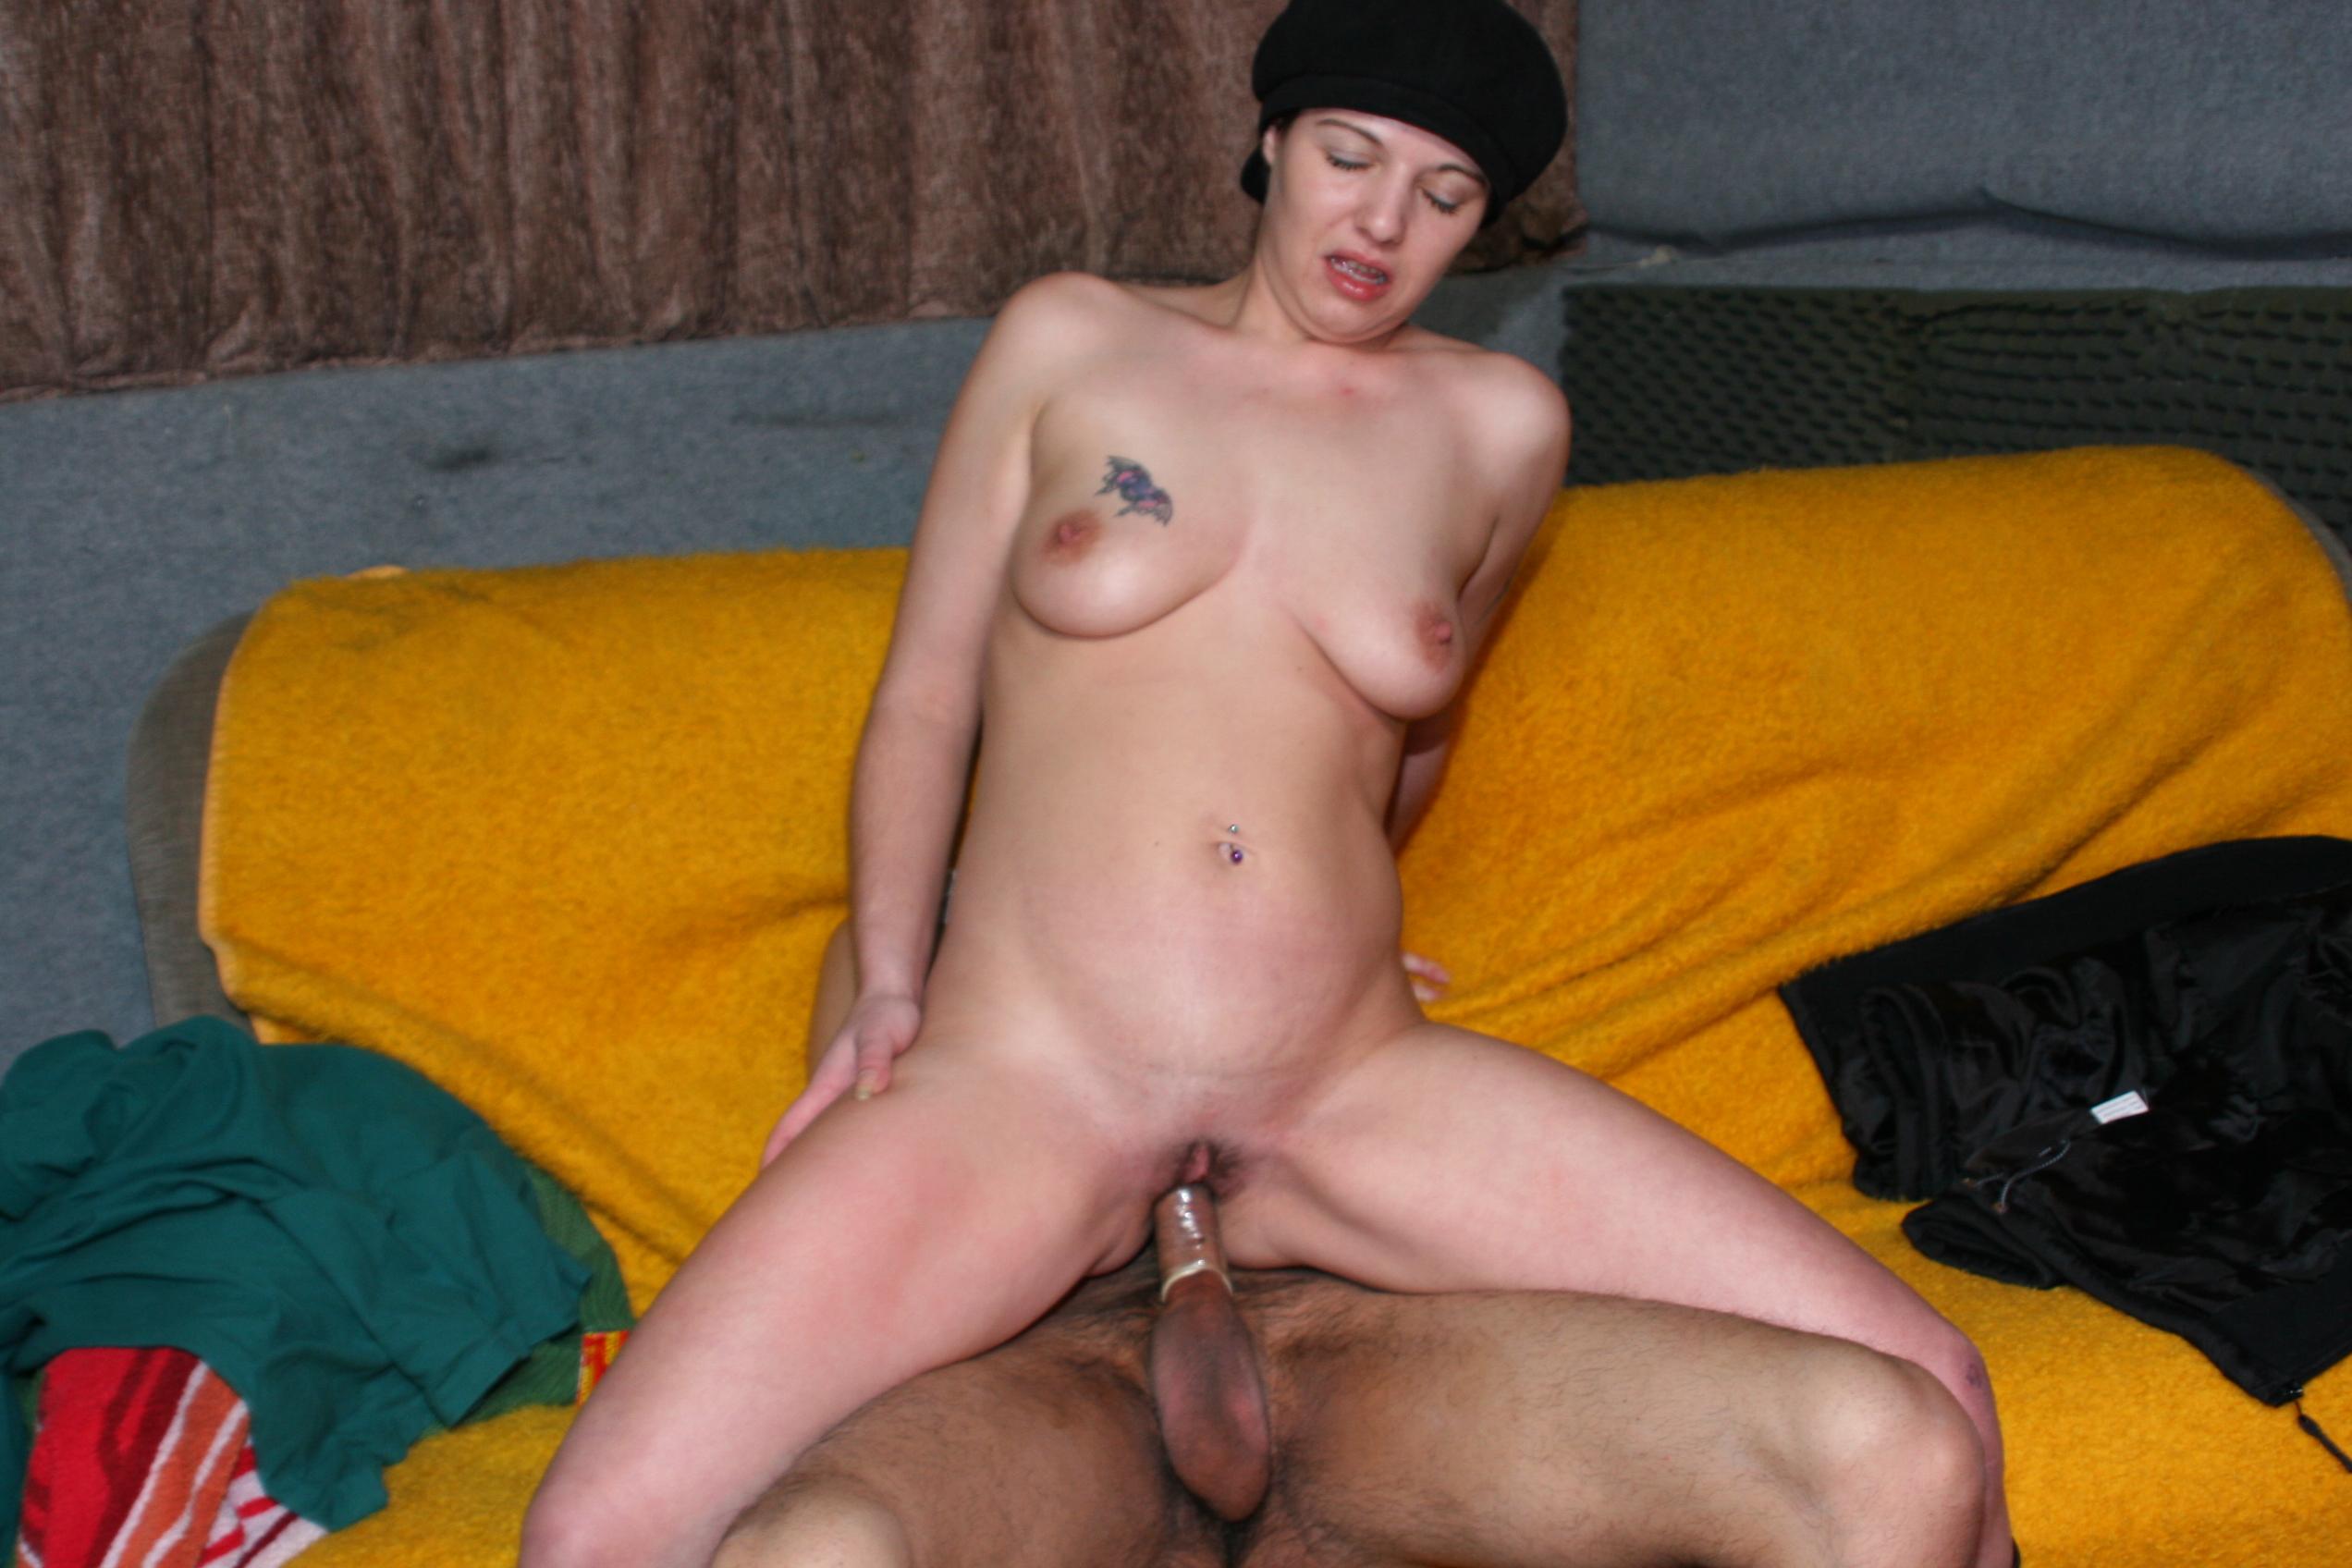 Dutch girls having anal sex